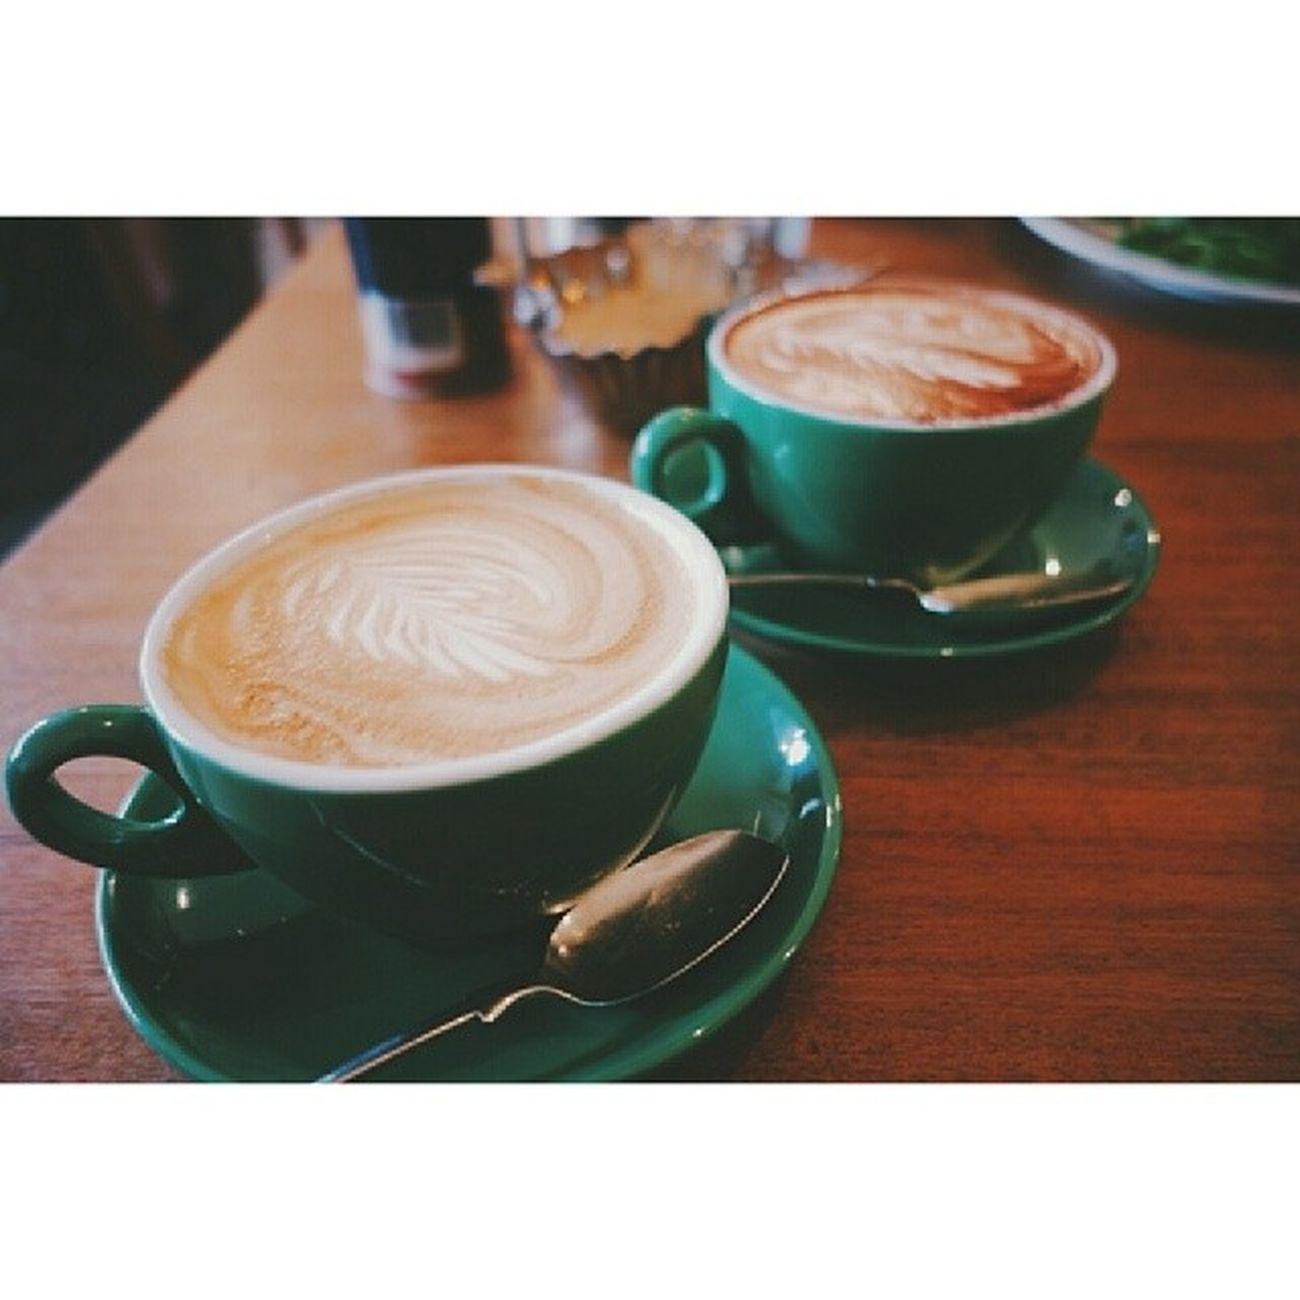 Gypsey &musquito Brunch Melbournecoffee Melbournecoffees Melbournecafe Vsco vscocam